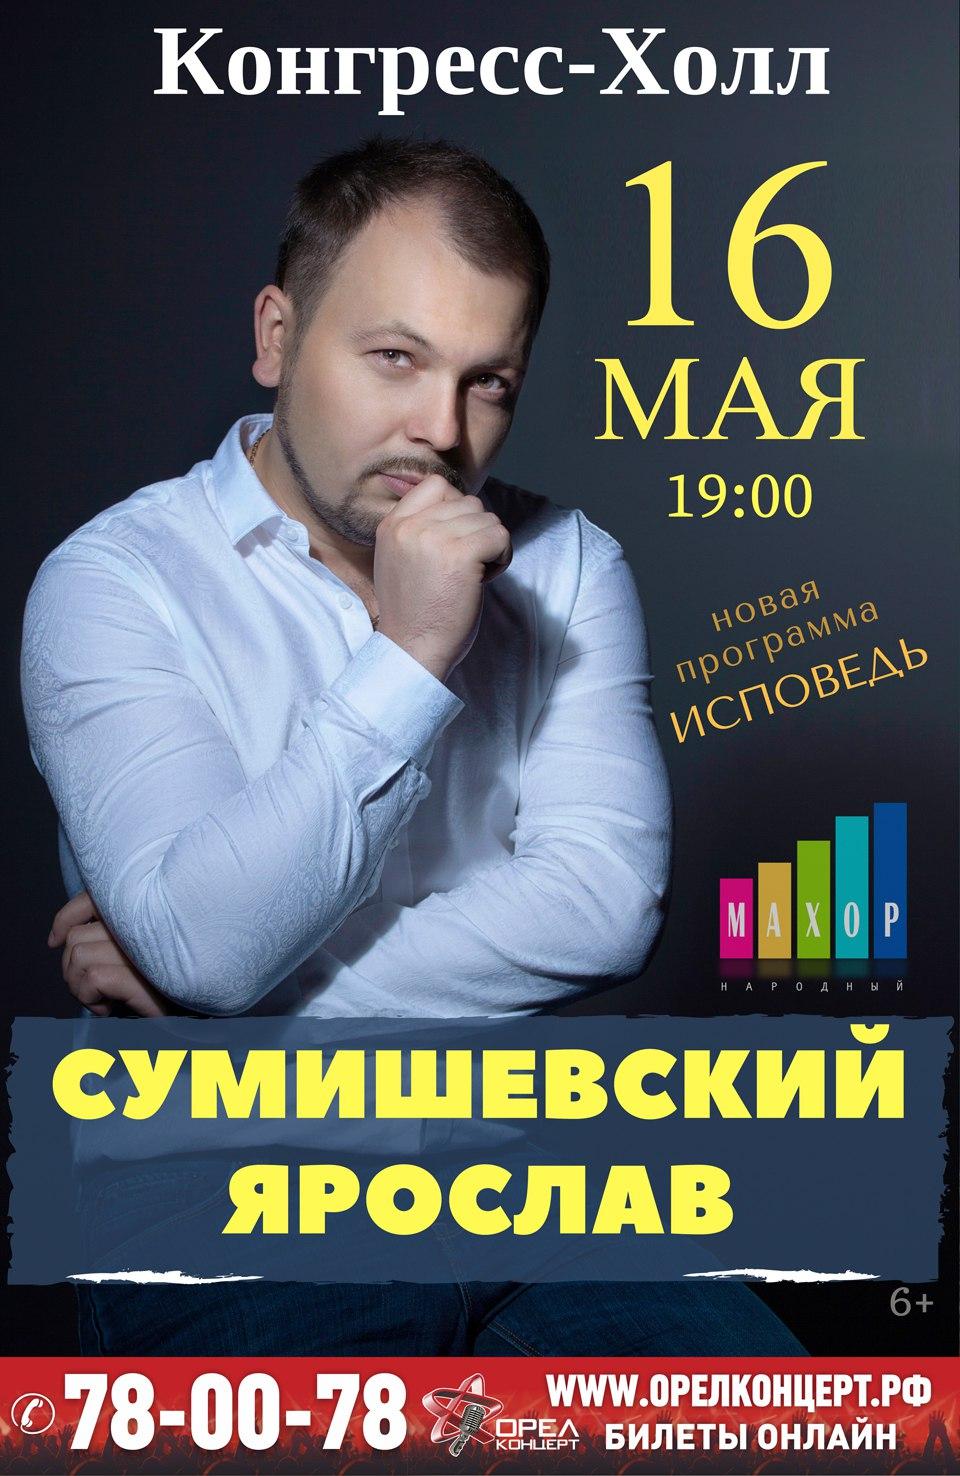 Ярослав Сумишевский «Исповедь»